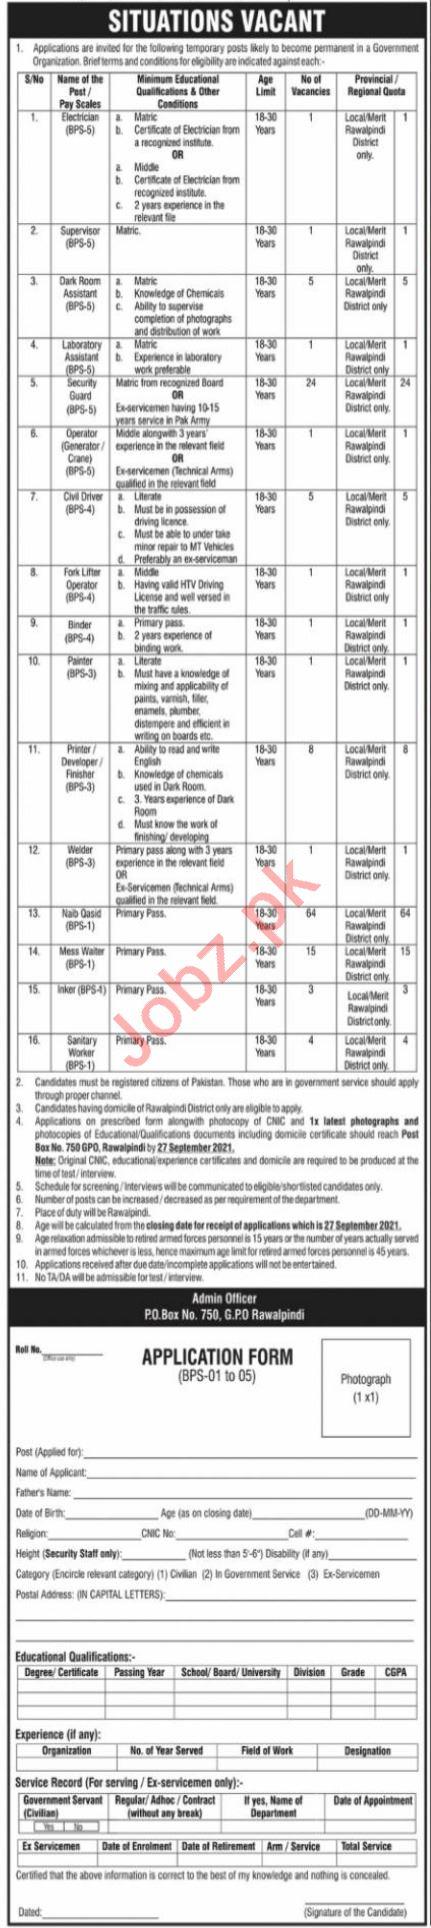 Government Organization Jobs 2021 In Rawalpindi